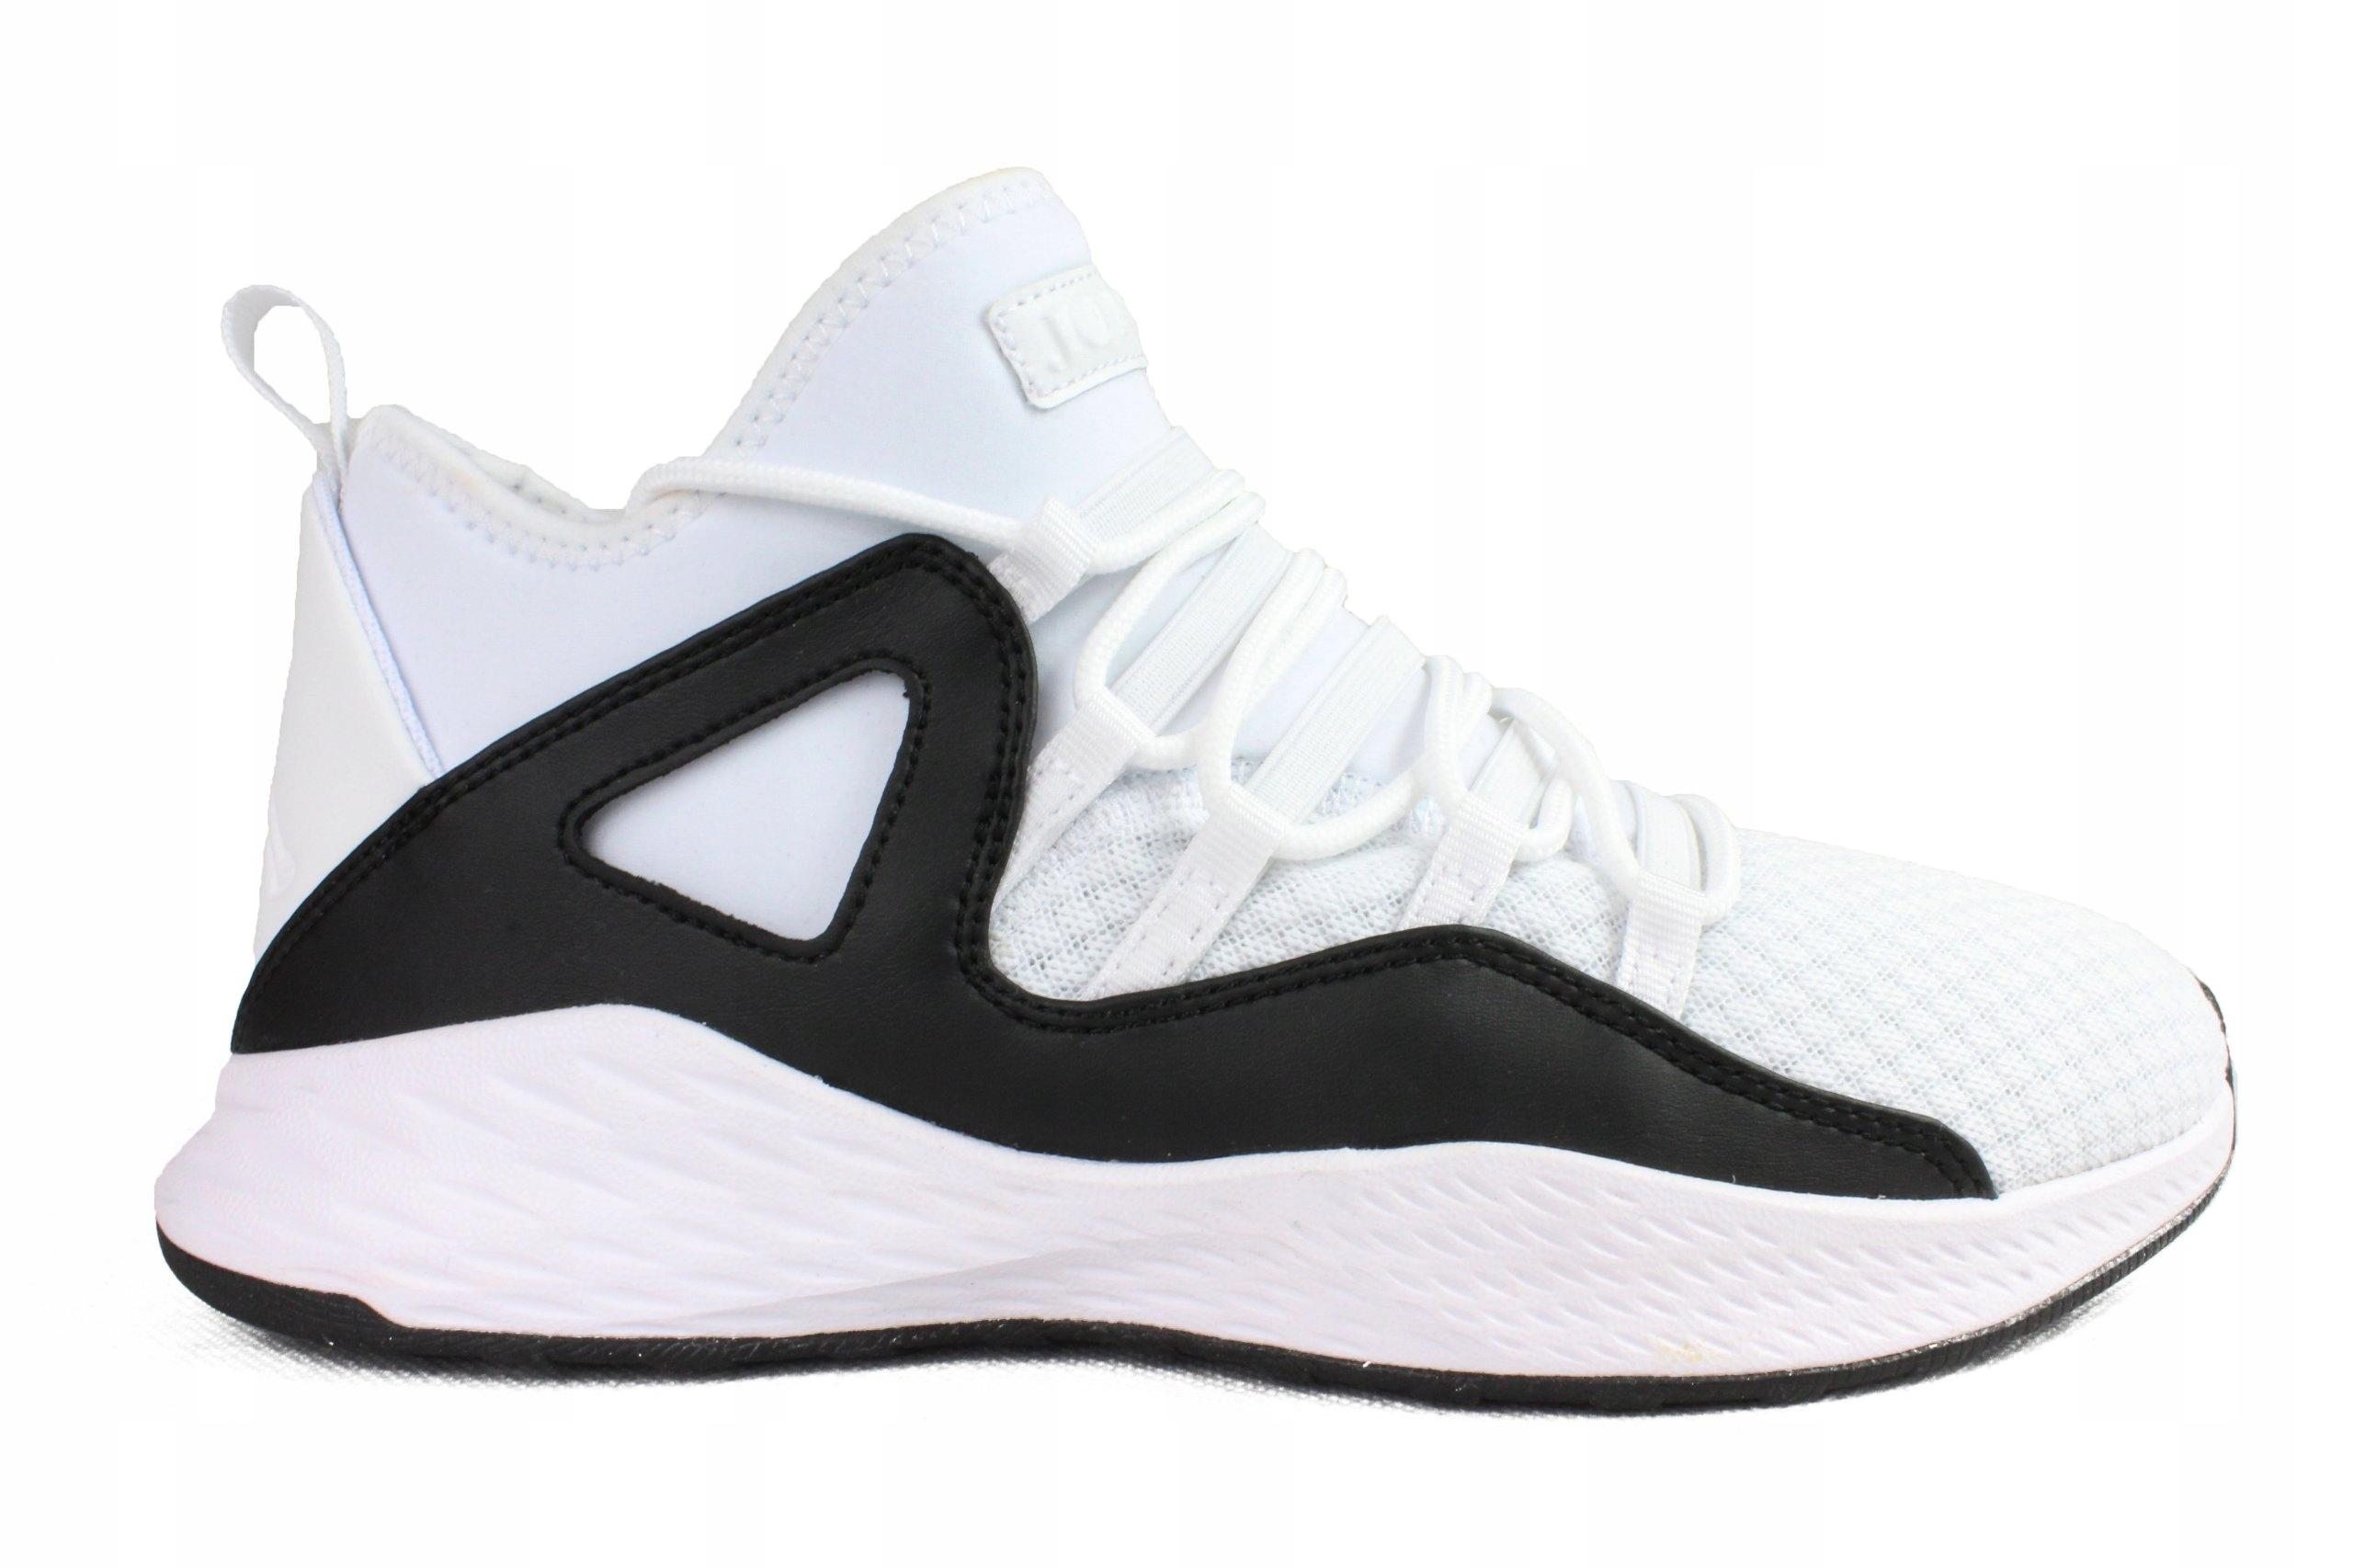 sale retailer 664f6 83290 Buty Nike Jordan Formula 23 roz. 41 Kobe Lebron Kd